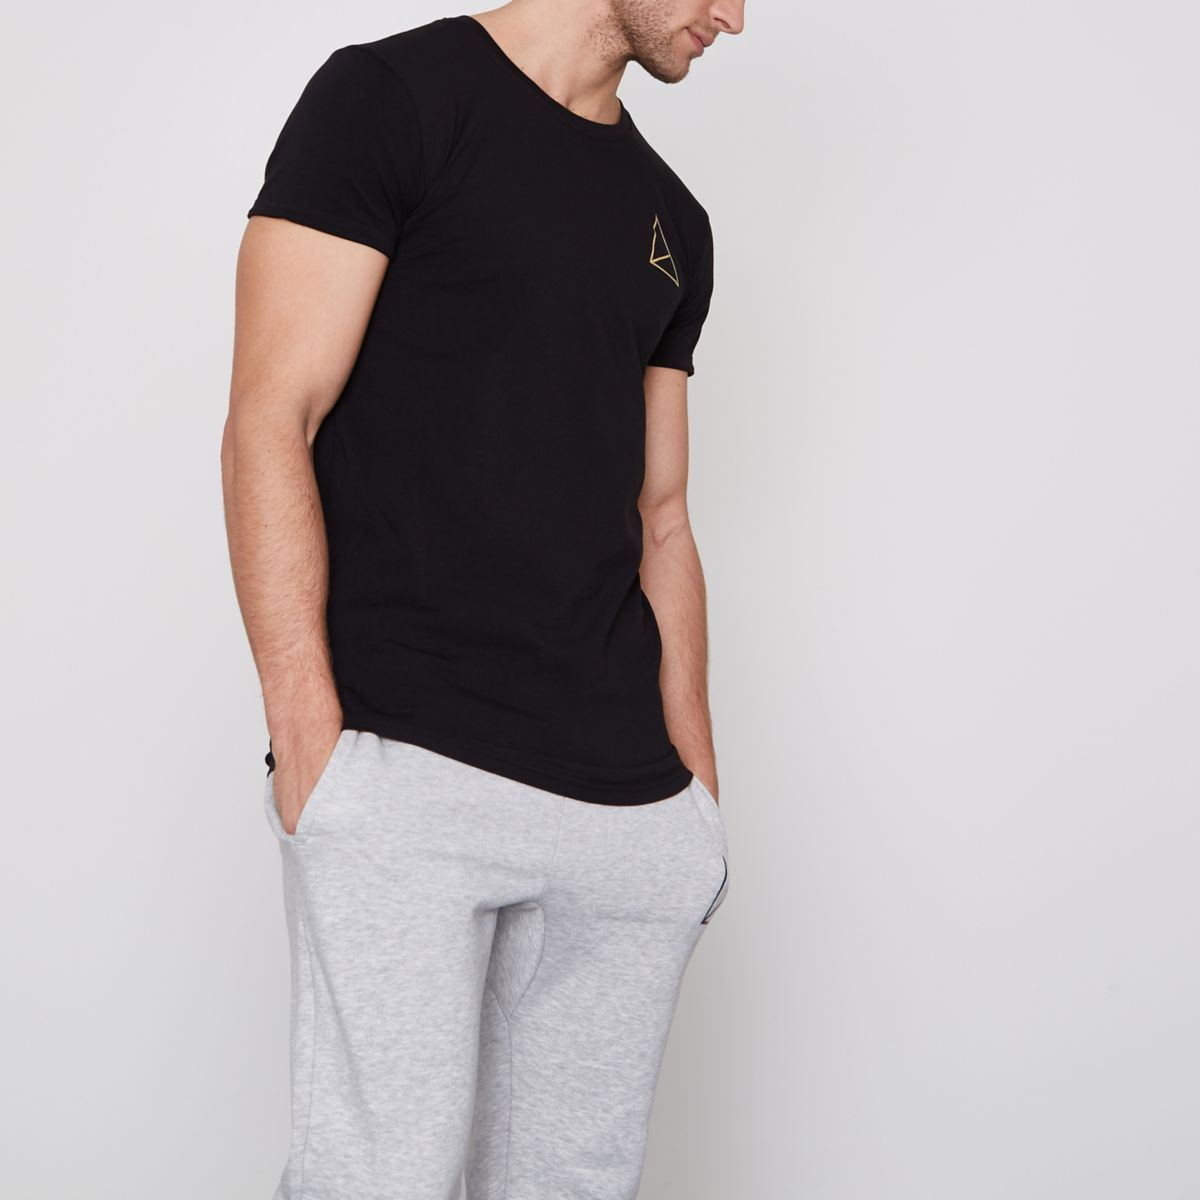 Black Golden Equation short sleeve T-shirt